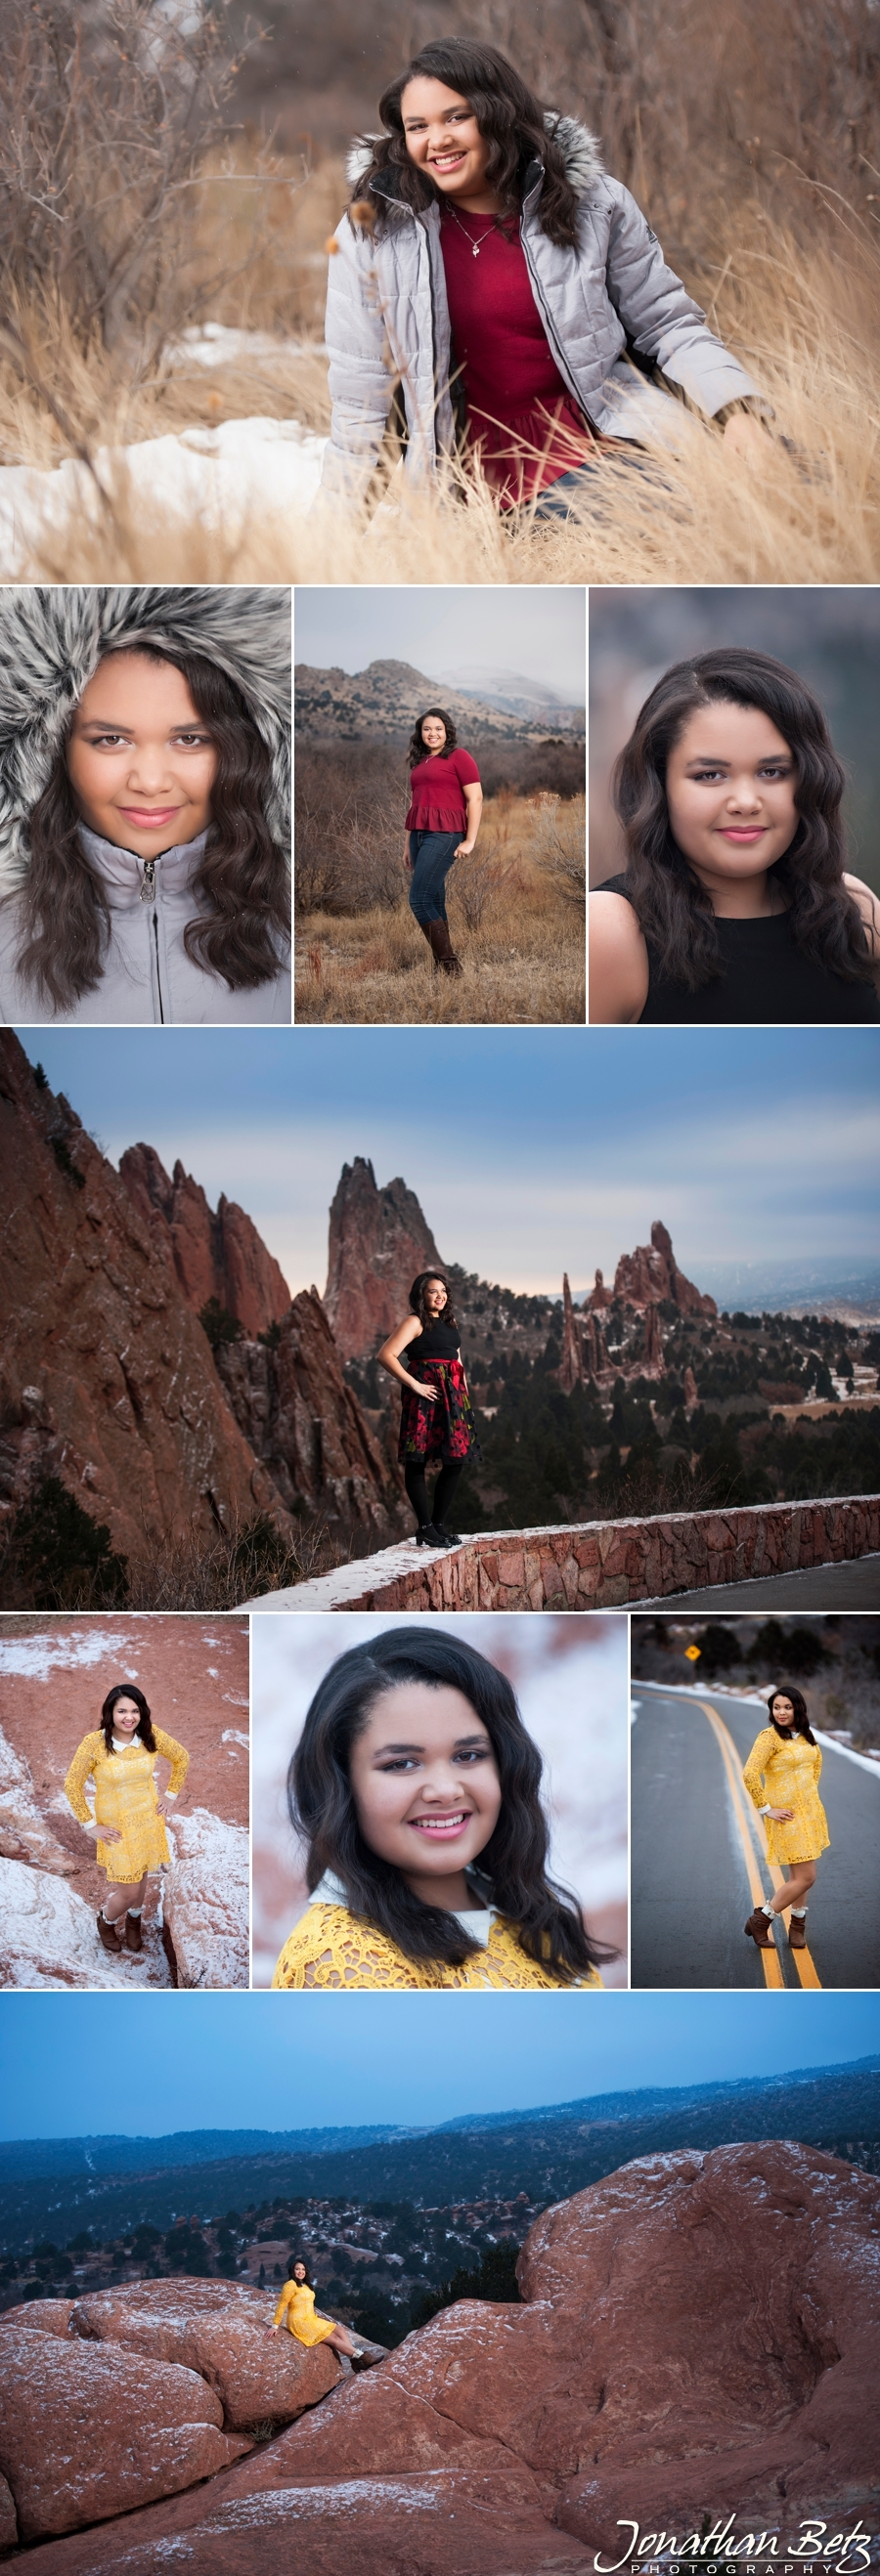 Jonathan Betz Photography Colorado Springs High School Senior Pictures Photographer